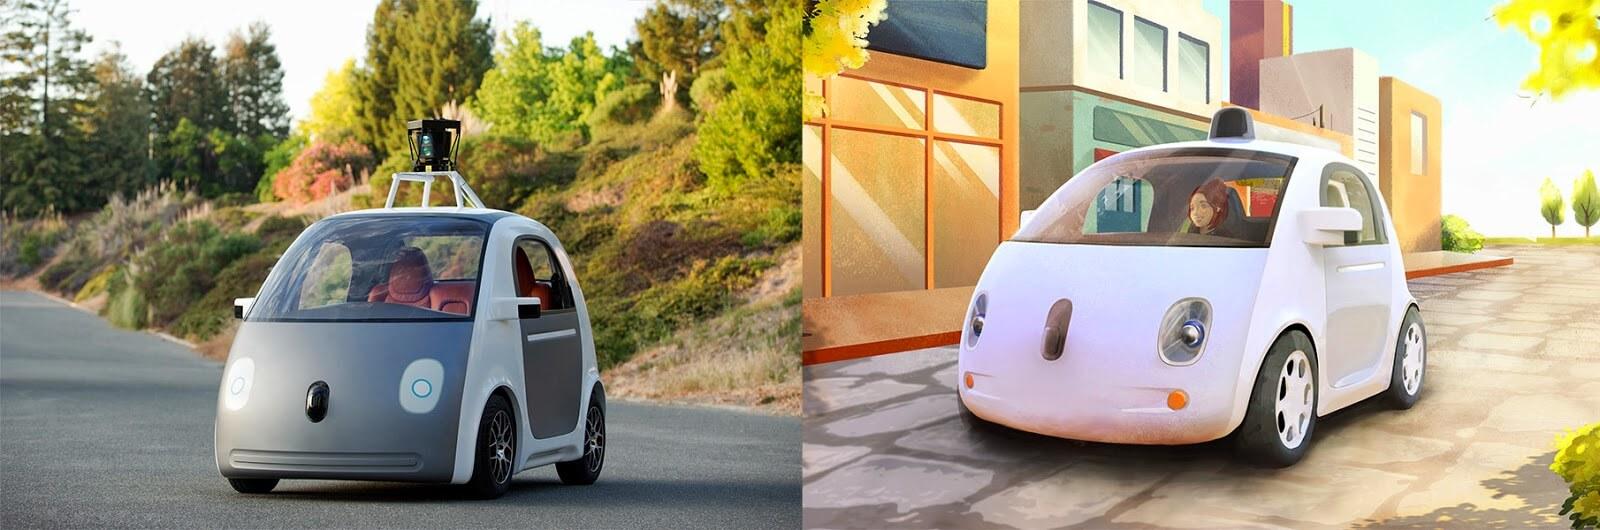 google-car-vehicle-prototype